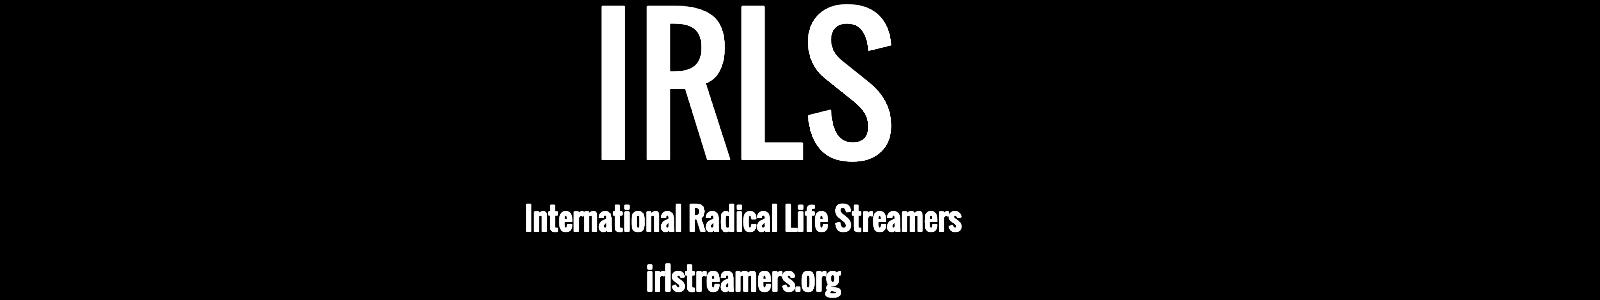 International Radical Life Streamers - IRLS - Business Sponsor of The DJ Sessions